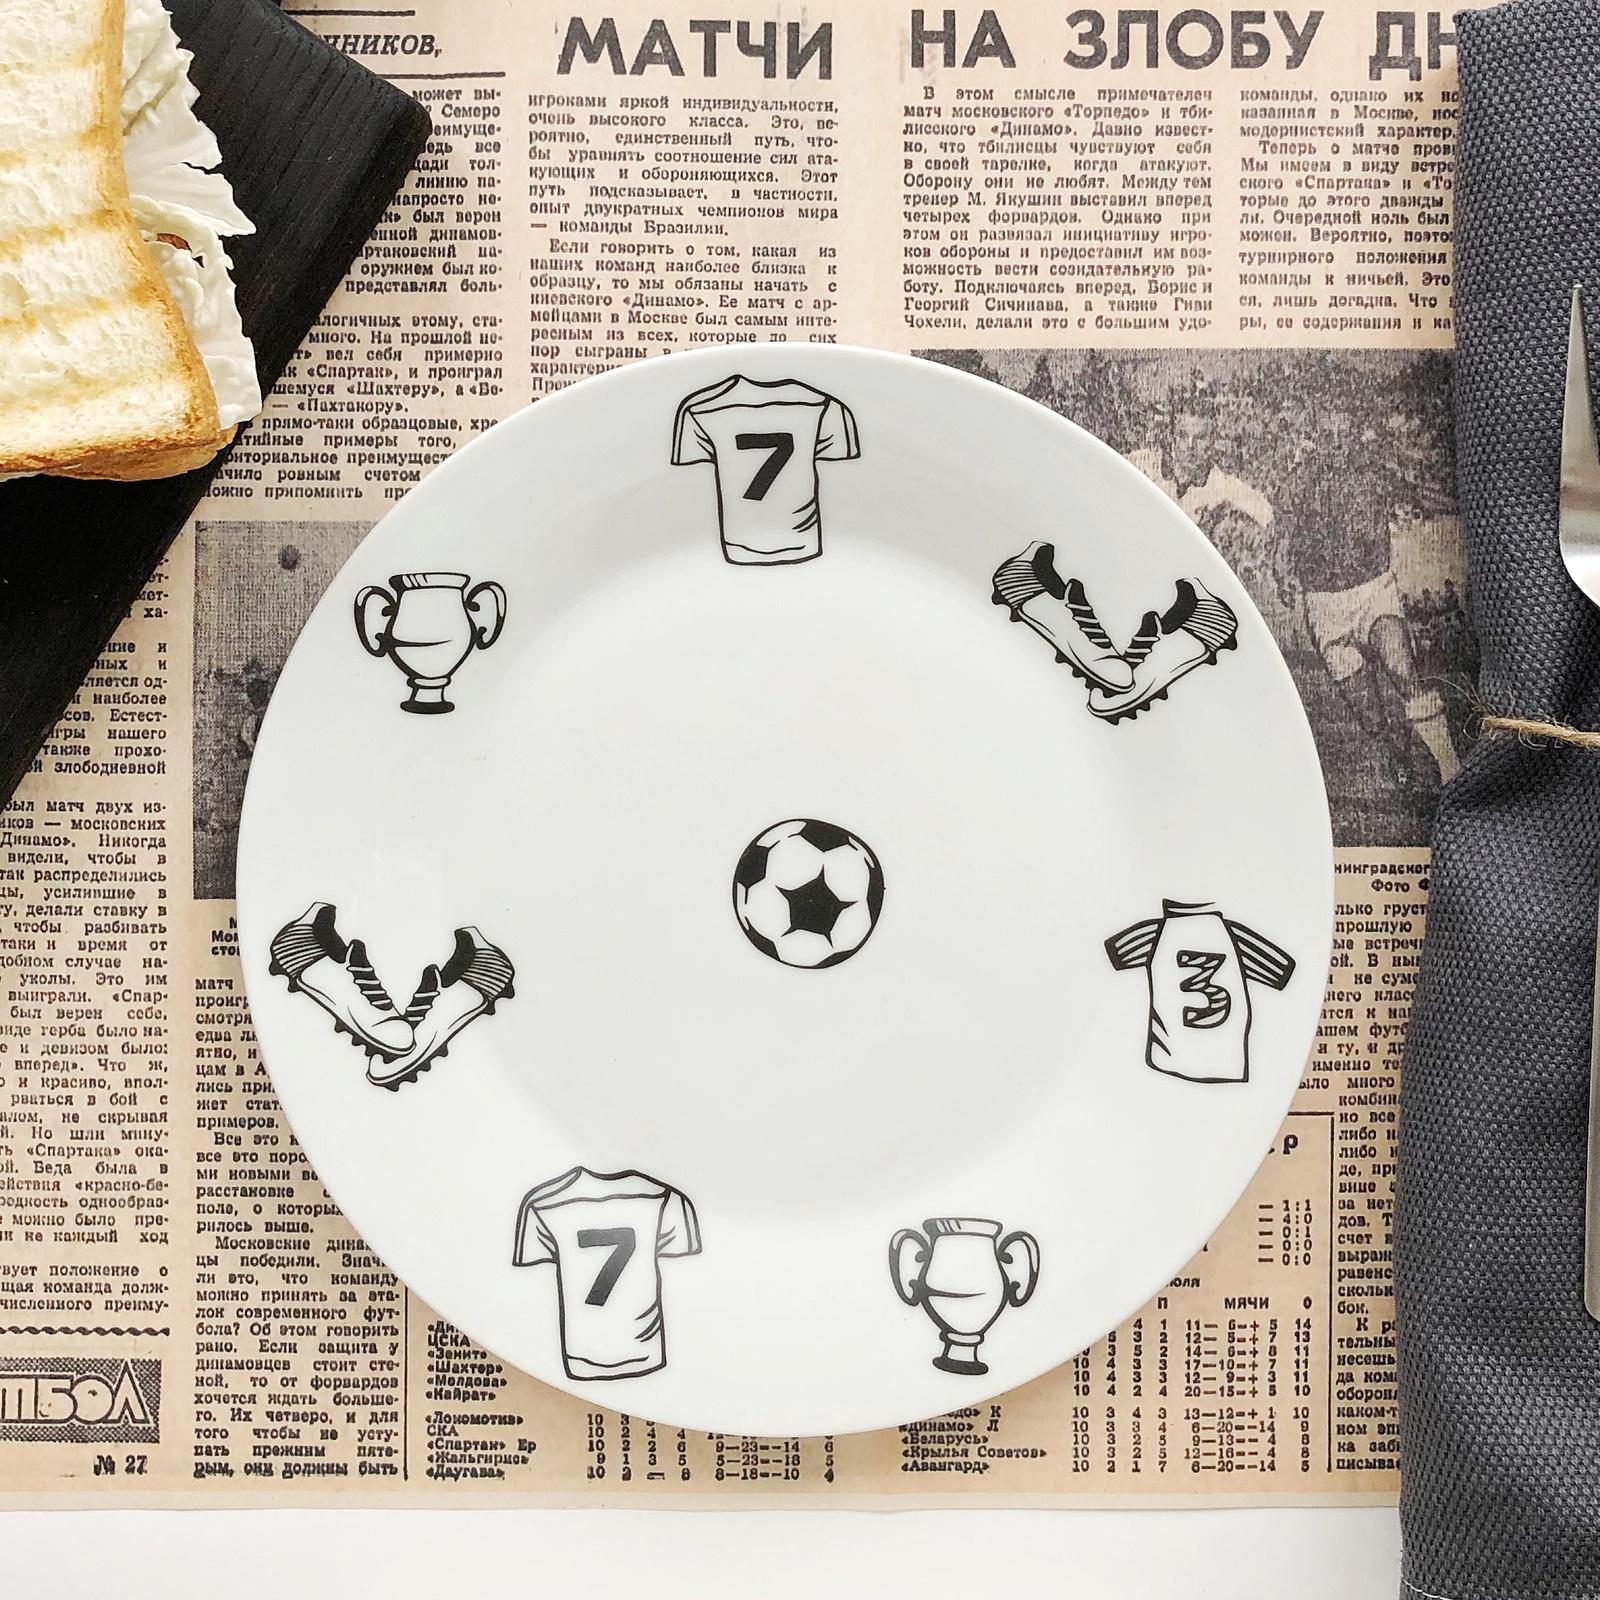 Тарелка Сотвори Чудо Поиграем? 20 см, белый тарелка мелкая сотвори чудо бантик sans brides диаметр 20 см